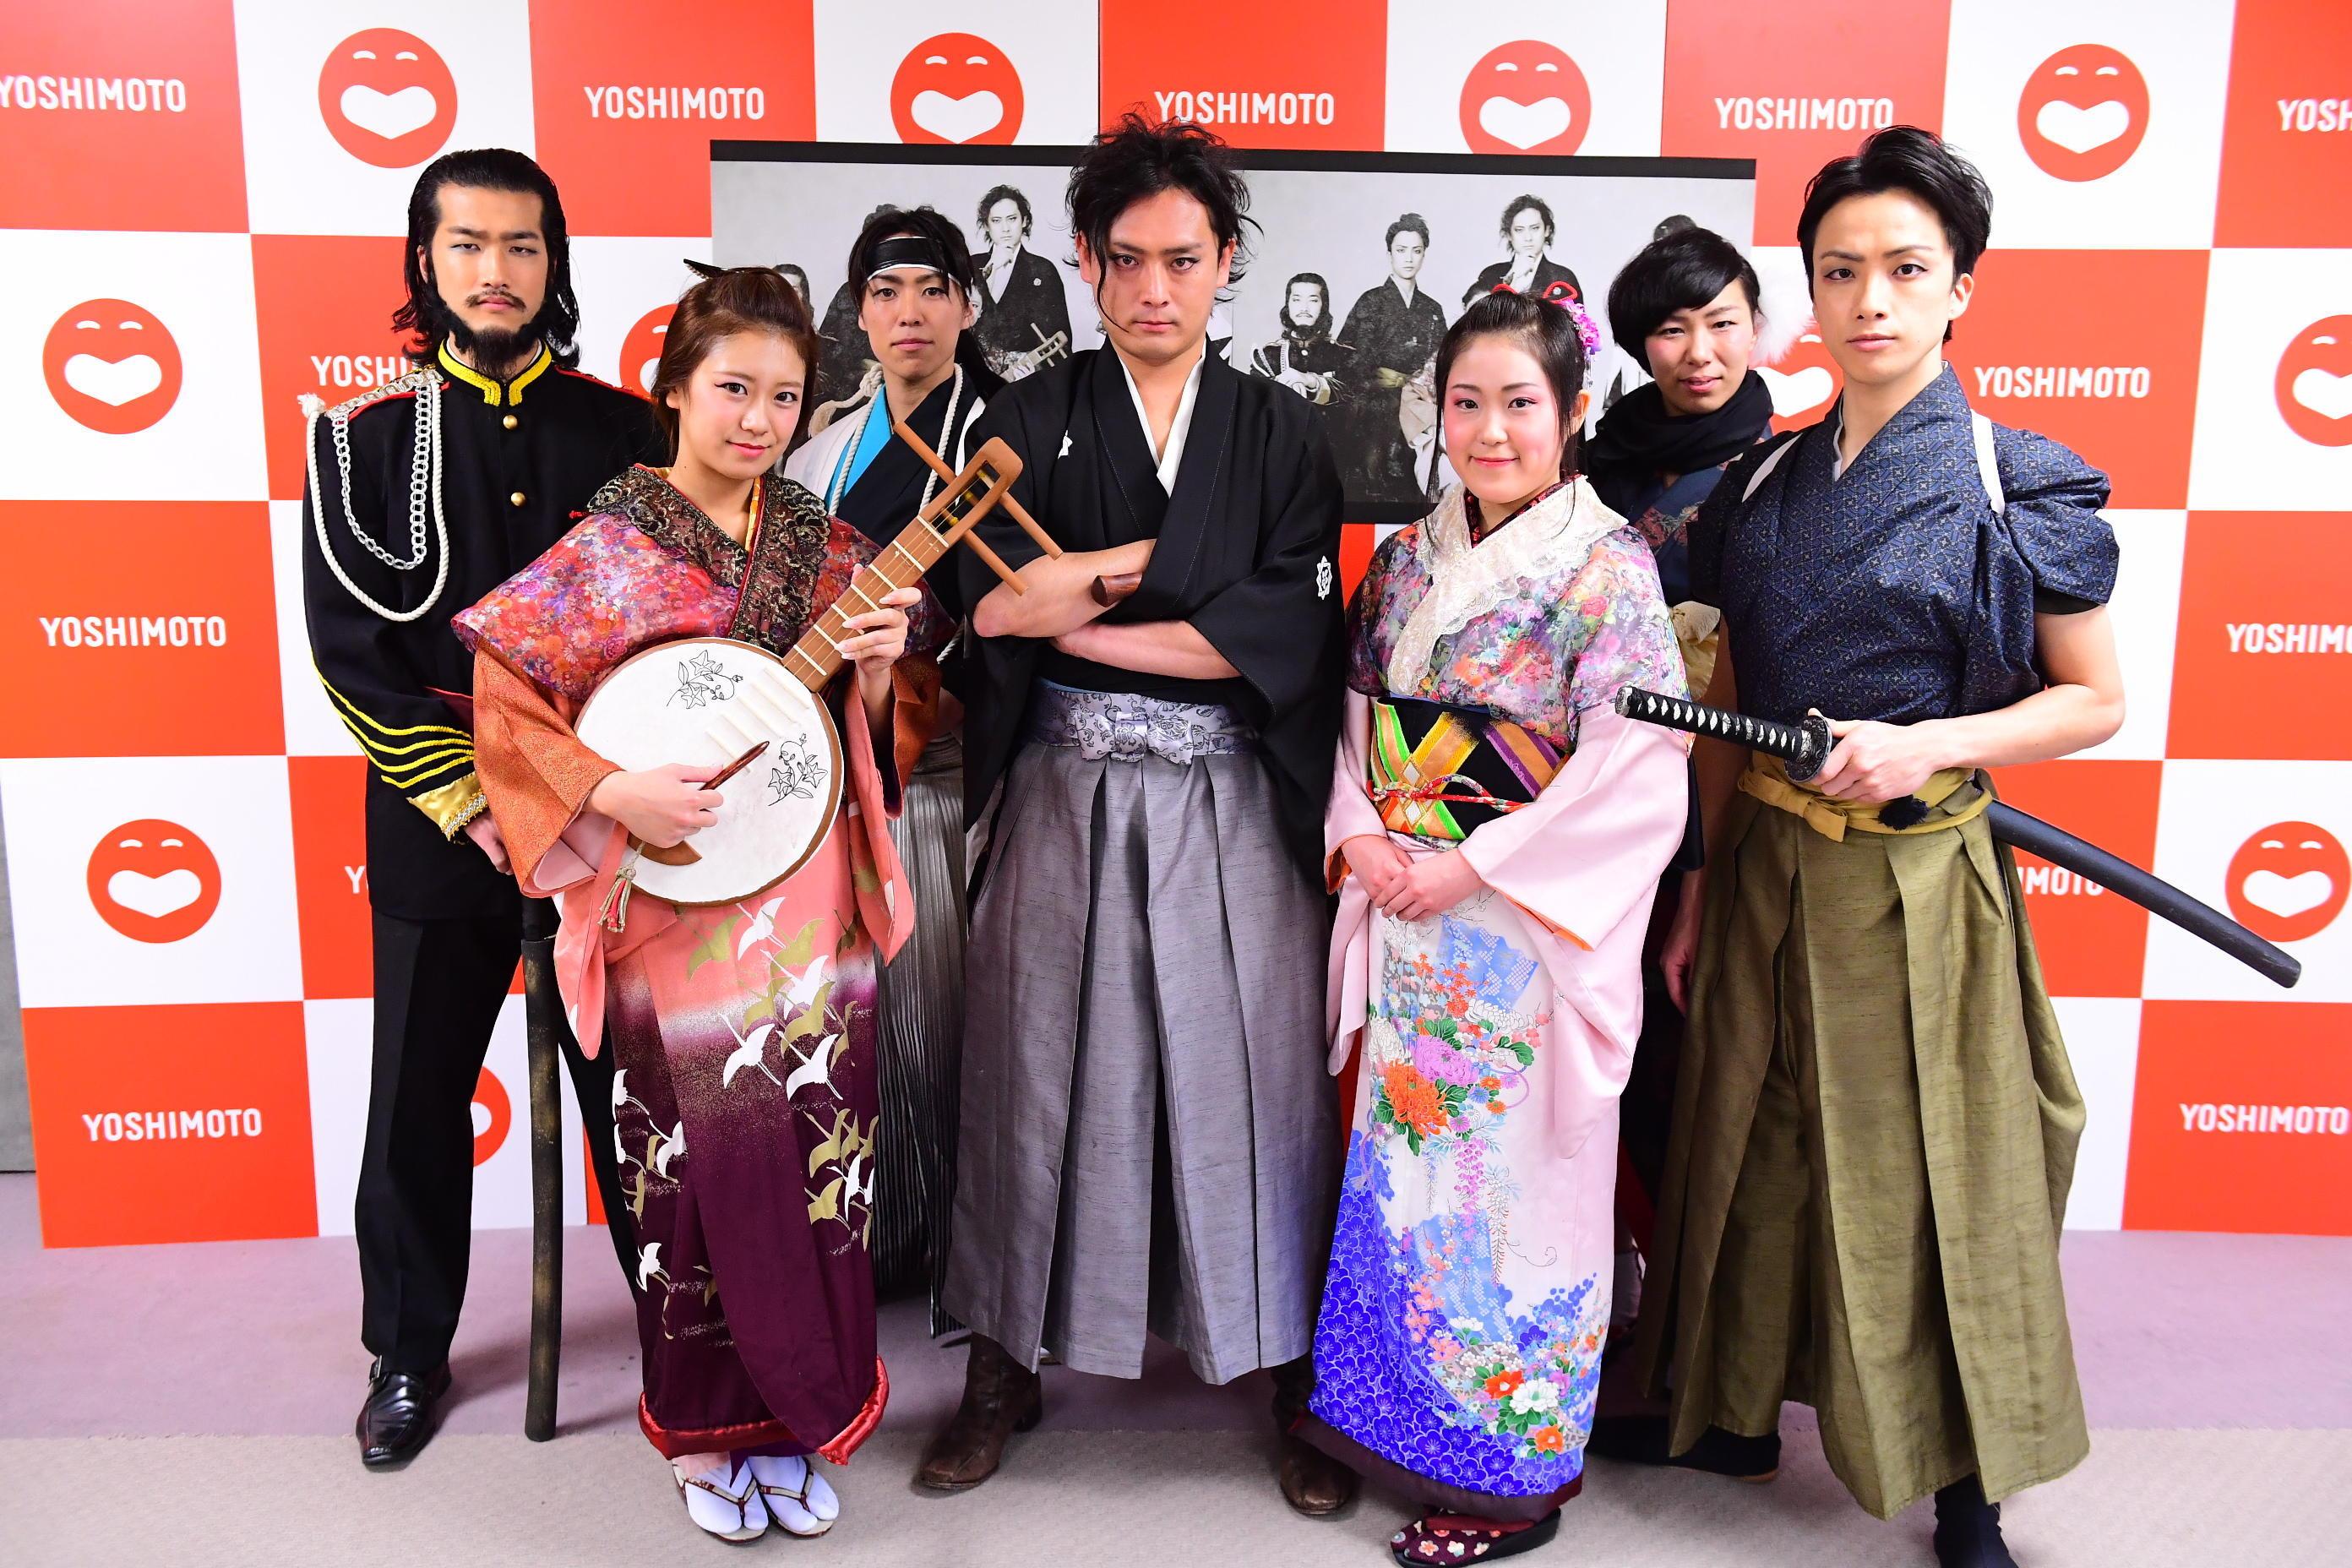 http://news.yoshimoto.co.jp/20170223194110-4293005de691c168c59cfa0a96bec881bd5f276b.jpg